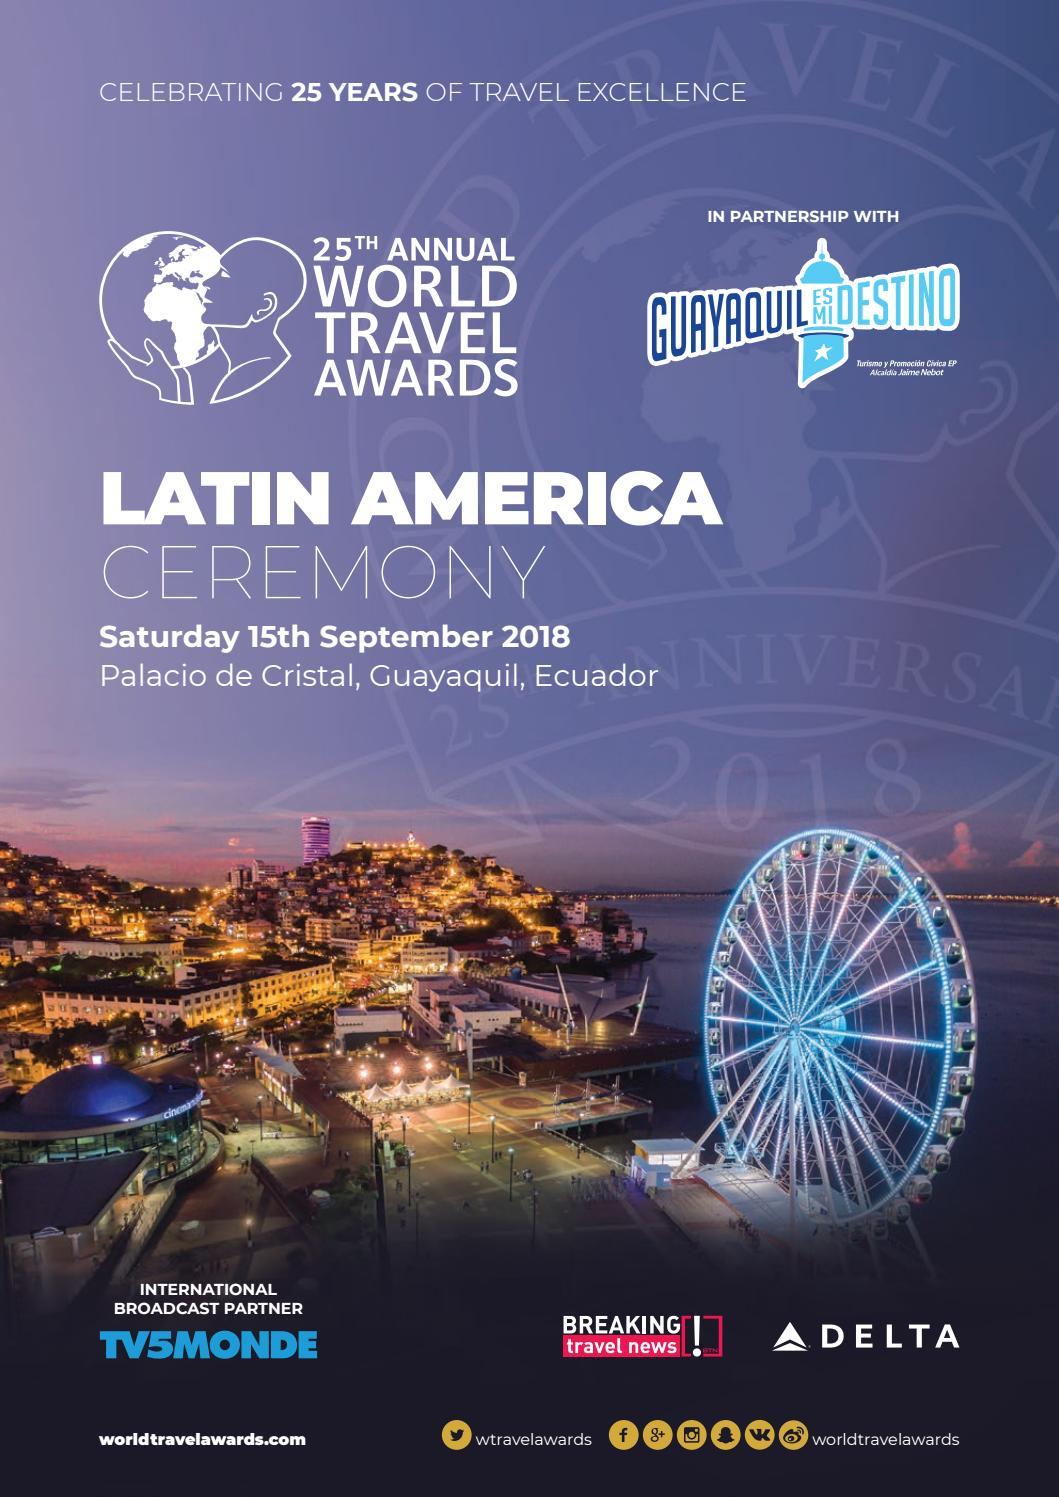 World Travel Awards Latin America Ceremony 2018 By World Travel